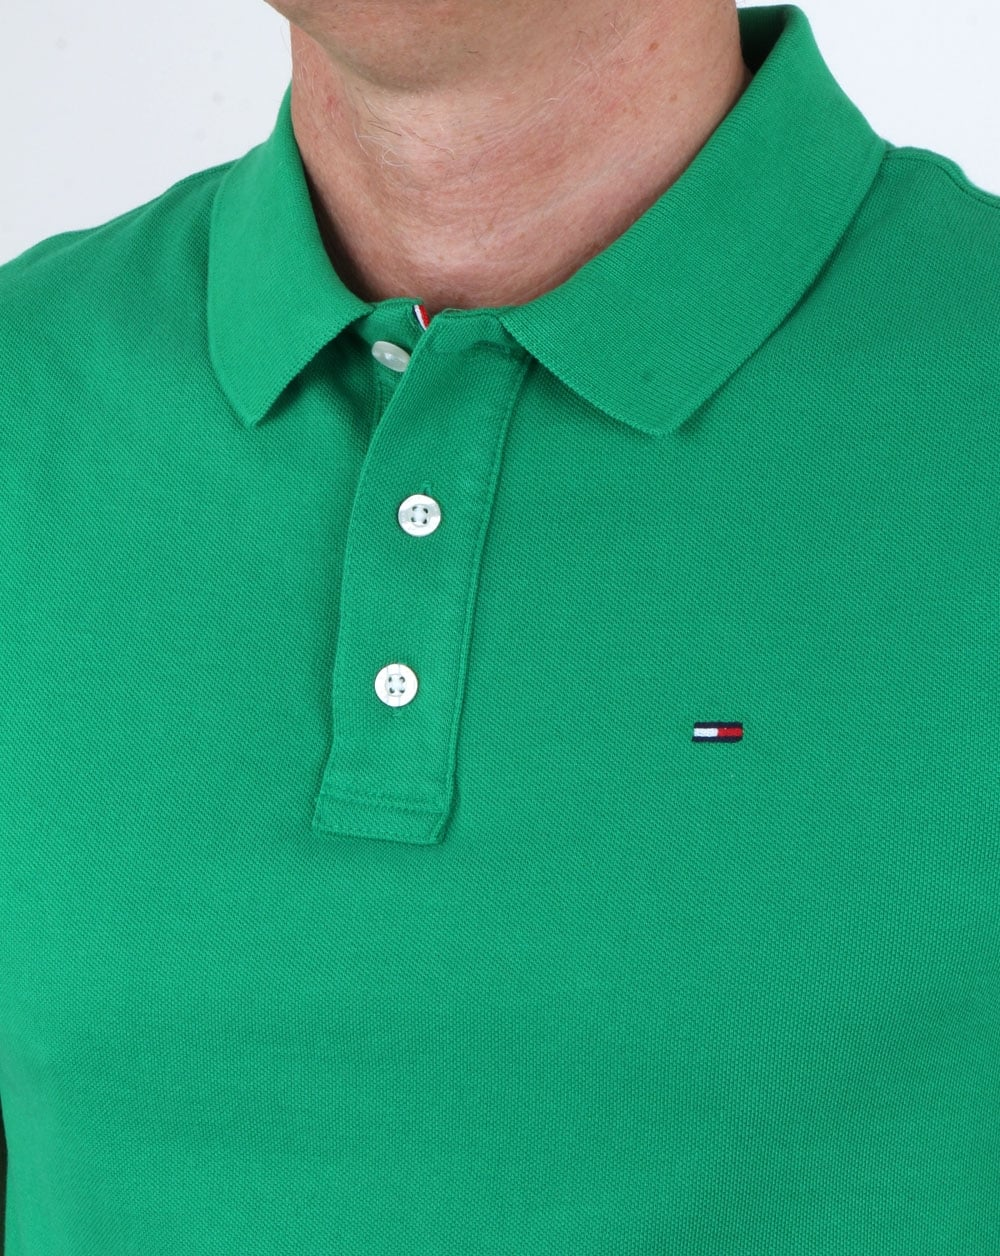 Tommy Hilfiger Cotton Pique Polo Shirt Green Mens Polo Shirt Cotton